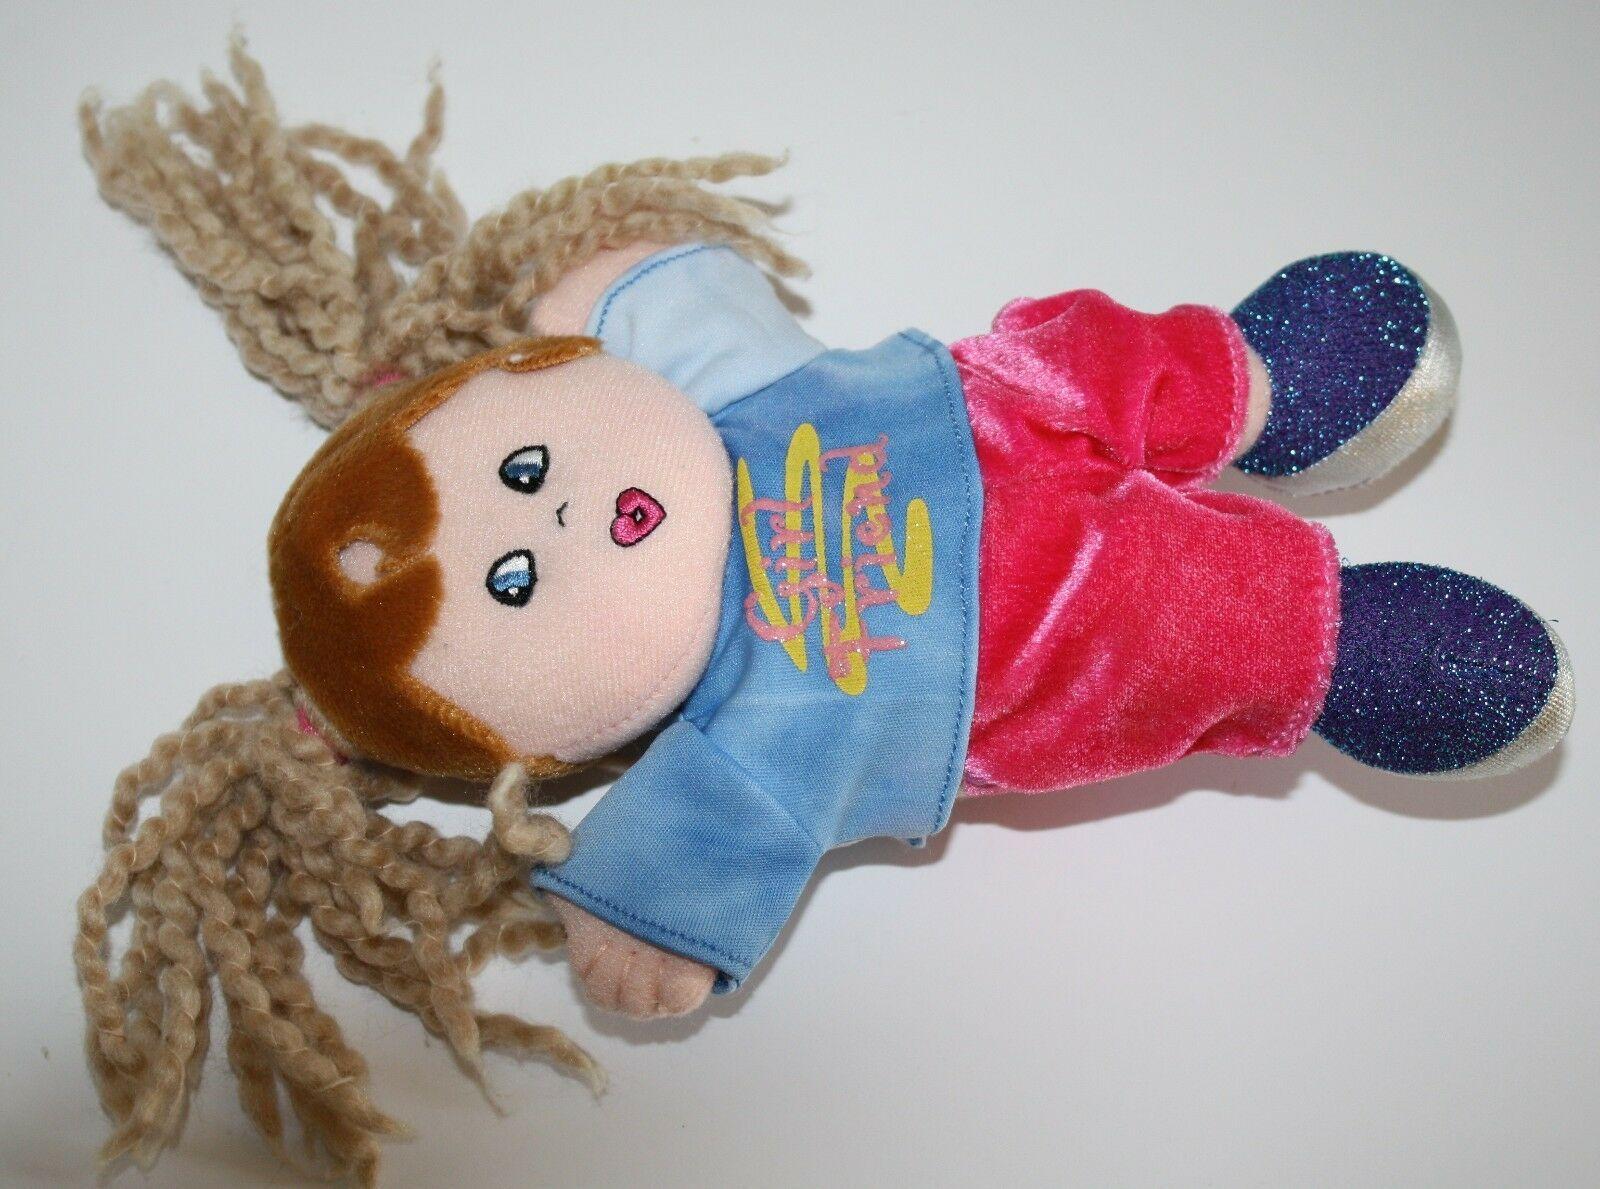 "Dan Dee Plush DOLL 9"" Girl Friend Blonde Yarn Pigtails Brown Hair Stuffed Soft image 3"